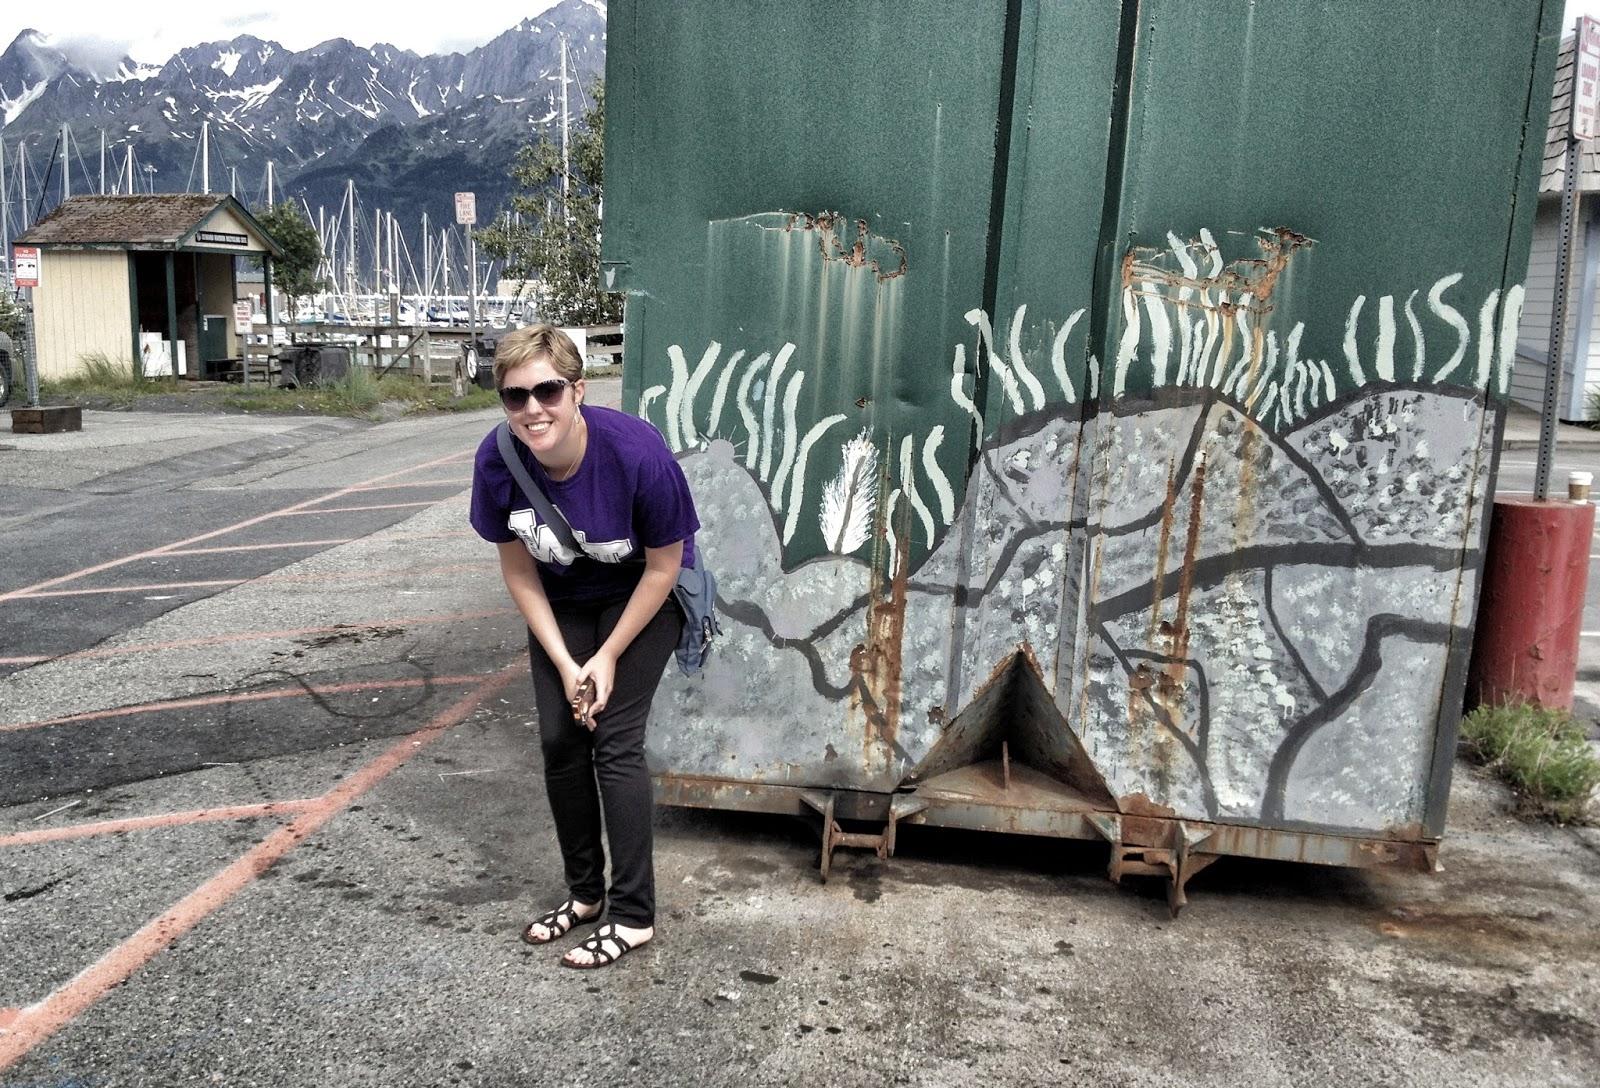 Say Cheese, #Seward #Alaska 2013 #thetravelingkristen